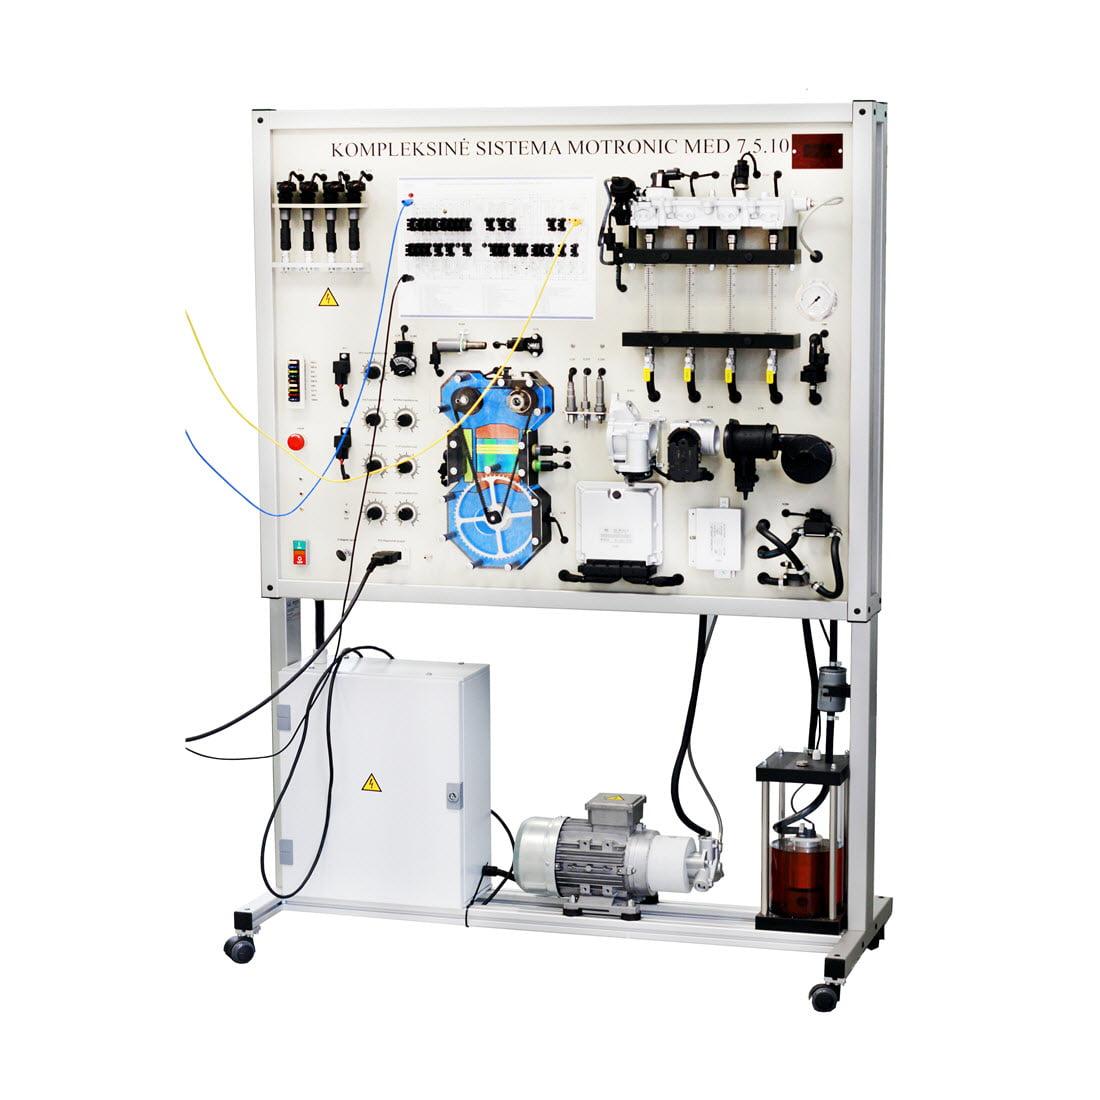 Auto Electrical Simulator Great Installation Of Wiring Diagram Circuit Training Board Bosch Motronic Fsi For Sale Rh Ryansautomotive Ie Steam Engine